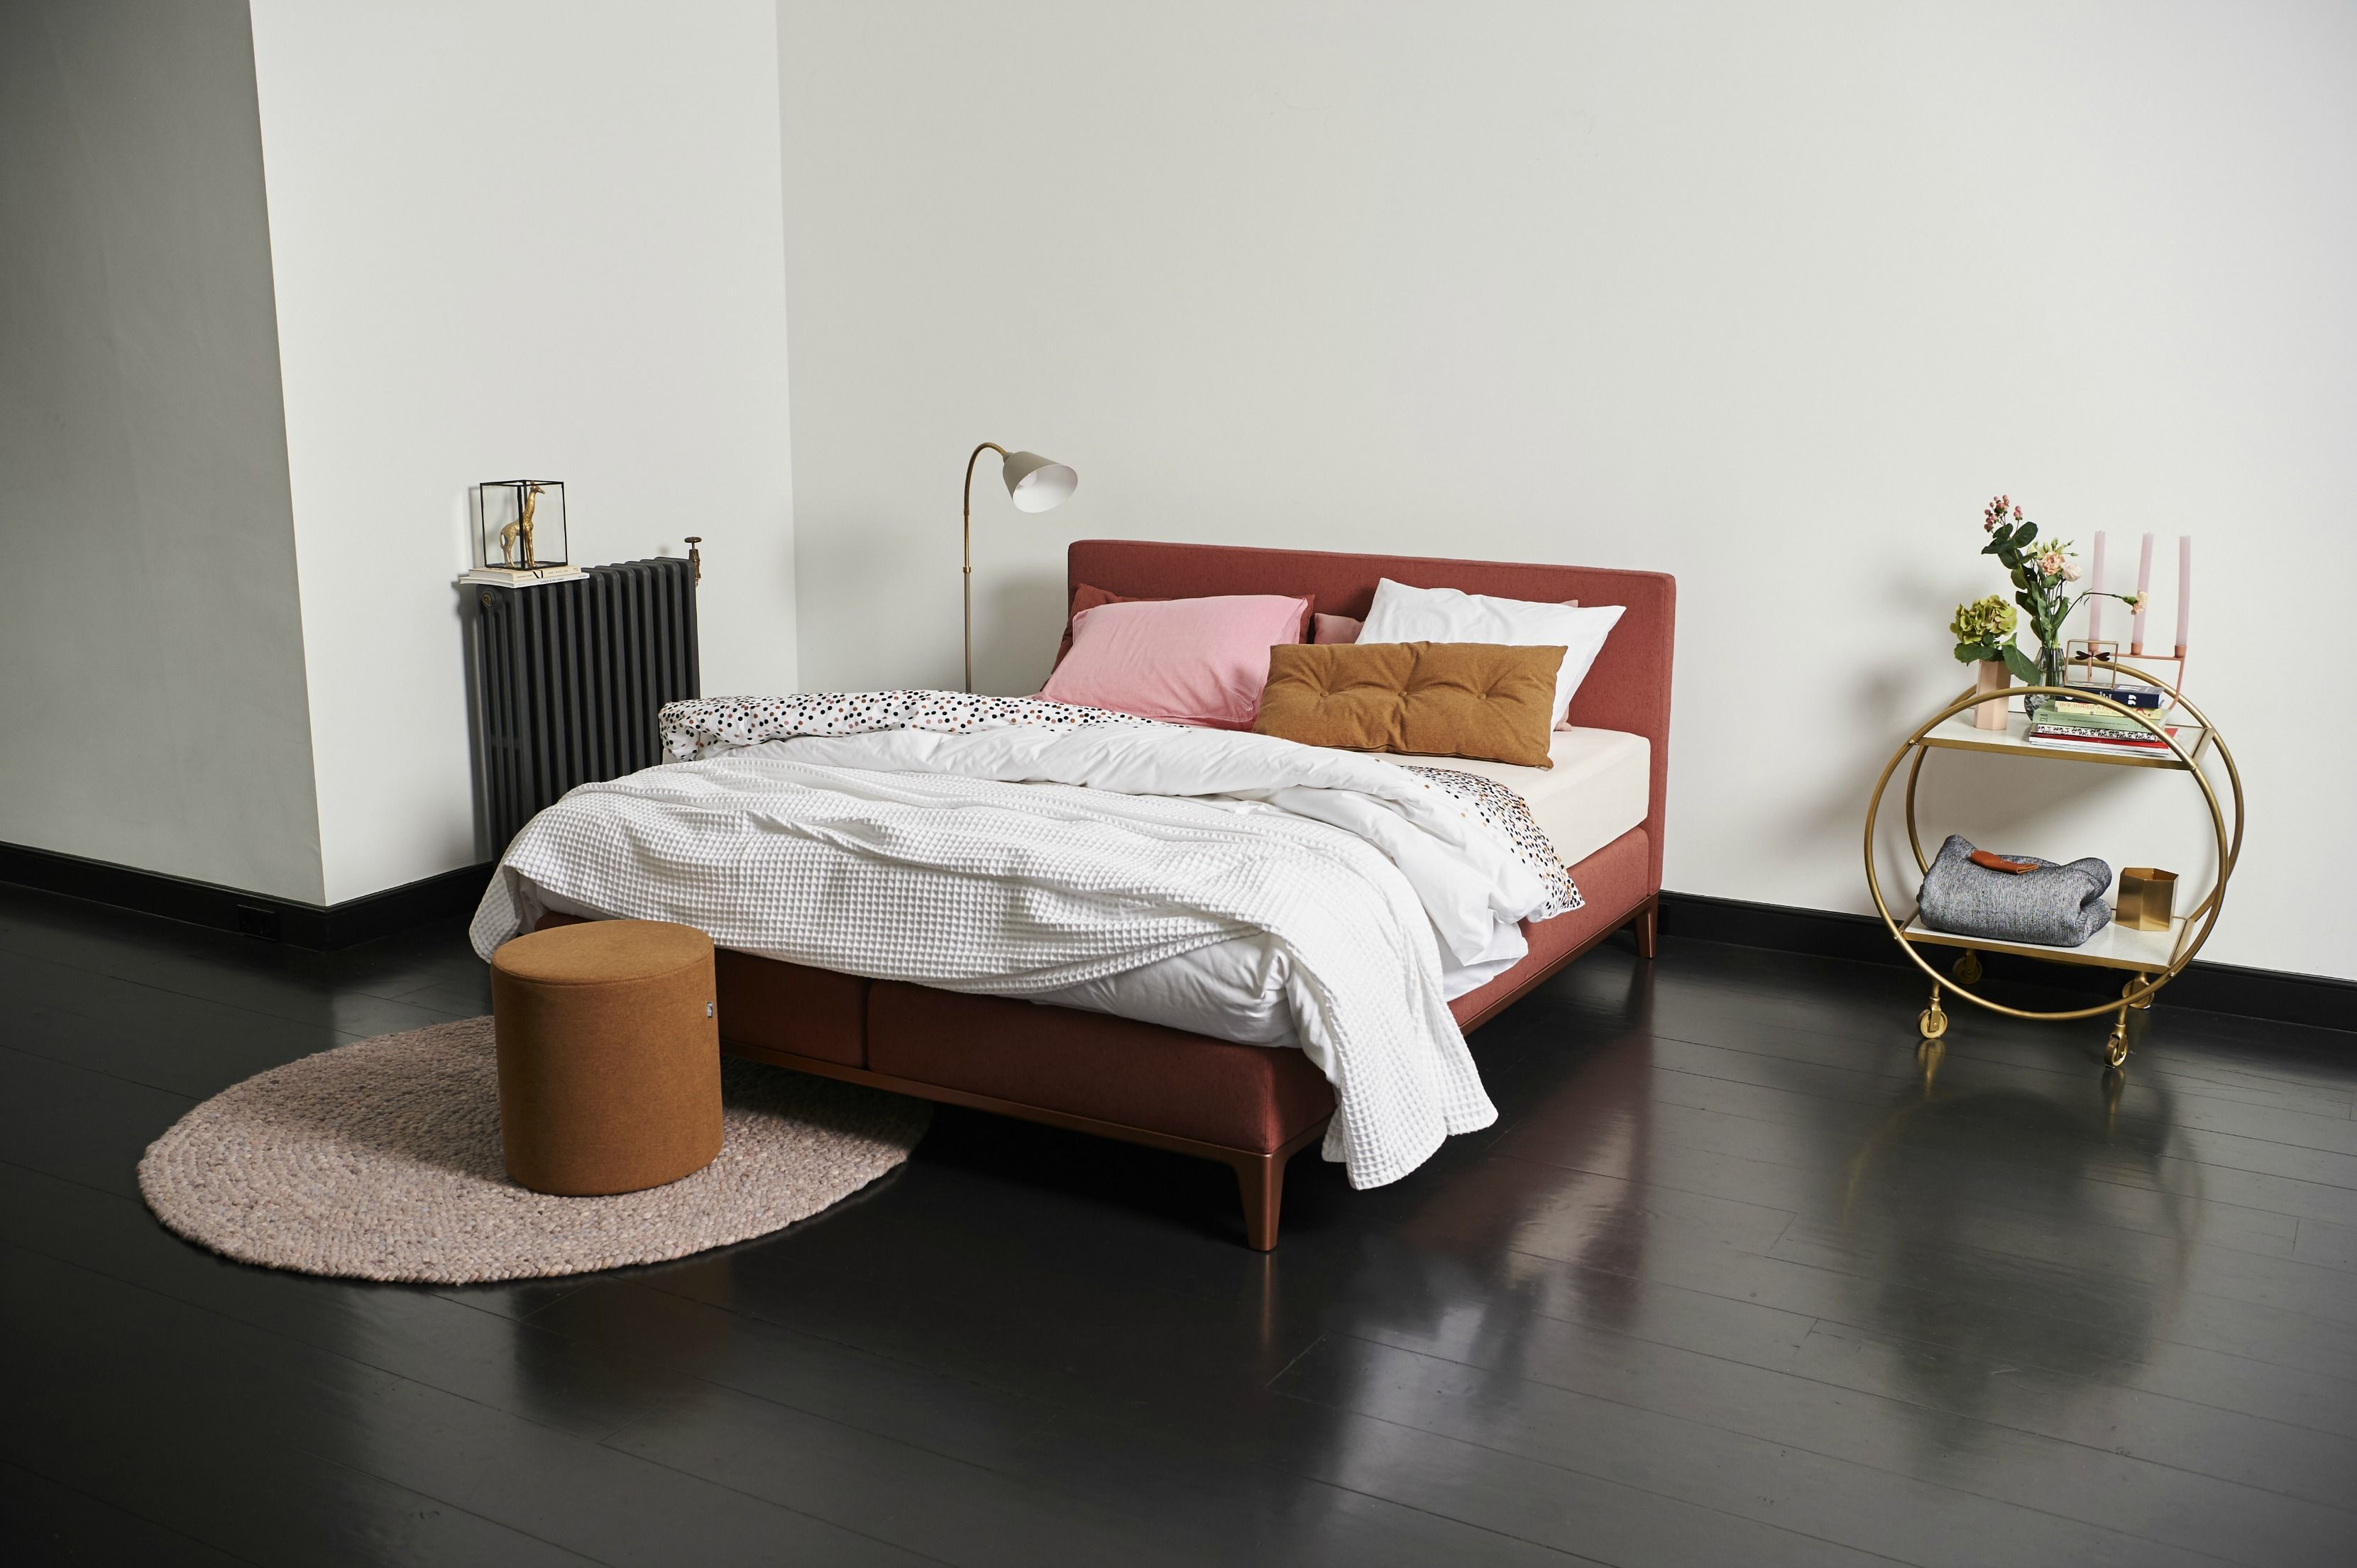 boxspringbett criade mit dem kopfteil plain der blickfang in ihrem schlafzimmer wundersch nes. Black Bedroom Furniture Sets. Home Design Ideas